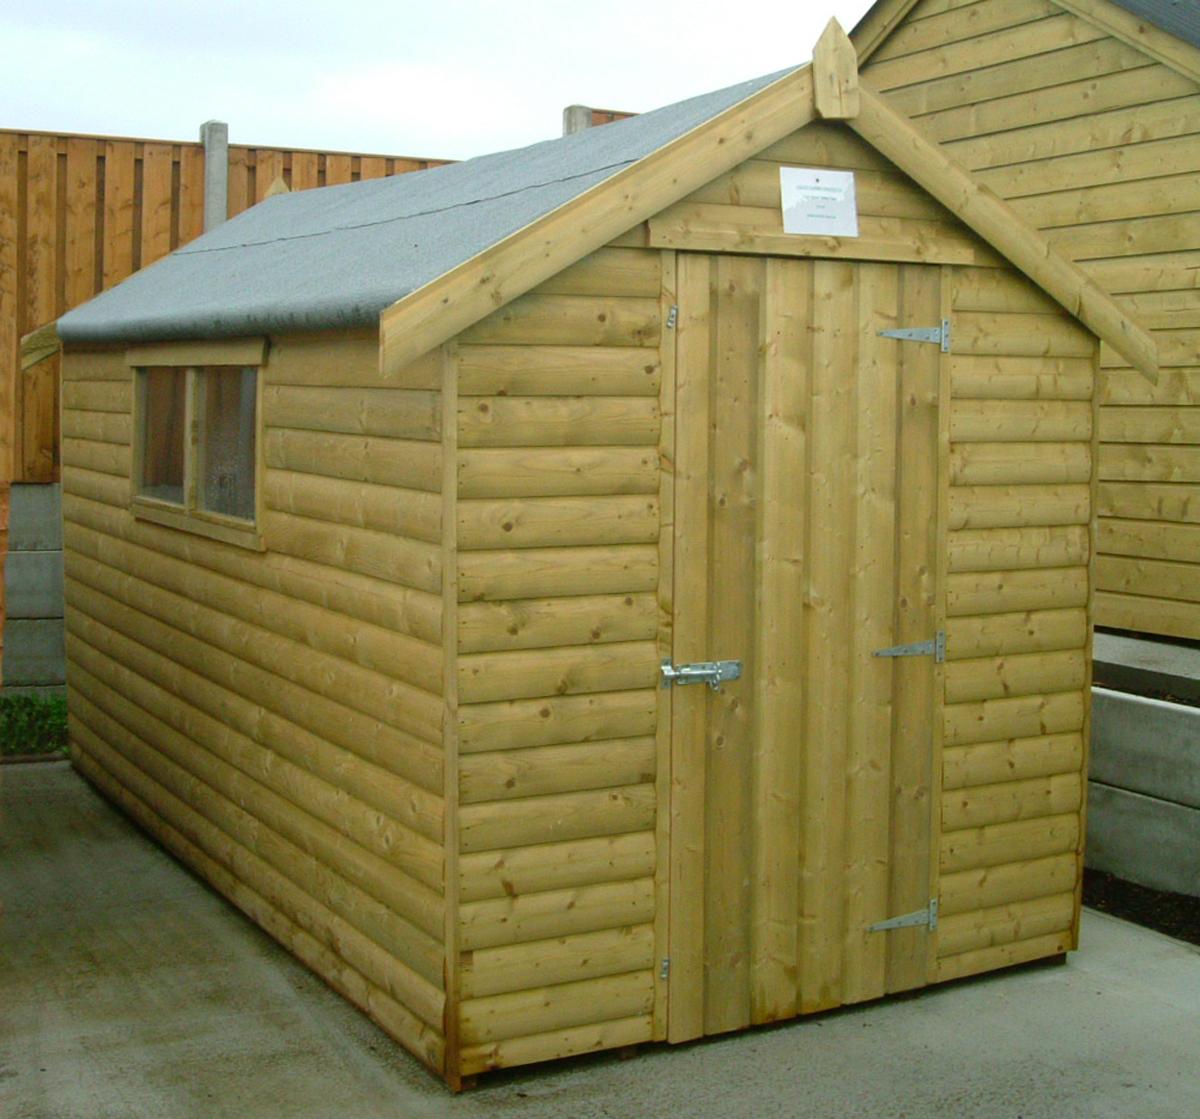 Garden Sheds Limerick garden sheds ireland | dublin wicklow wexford sheds fencing